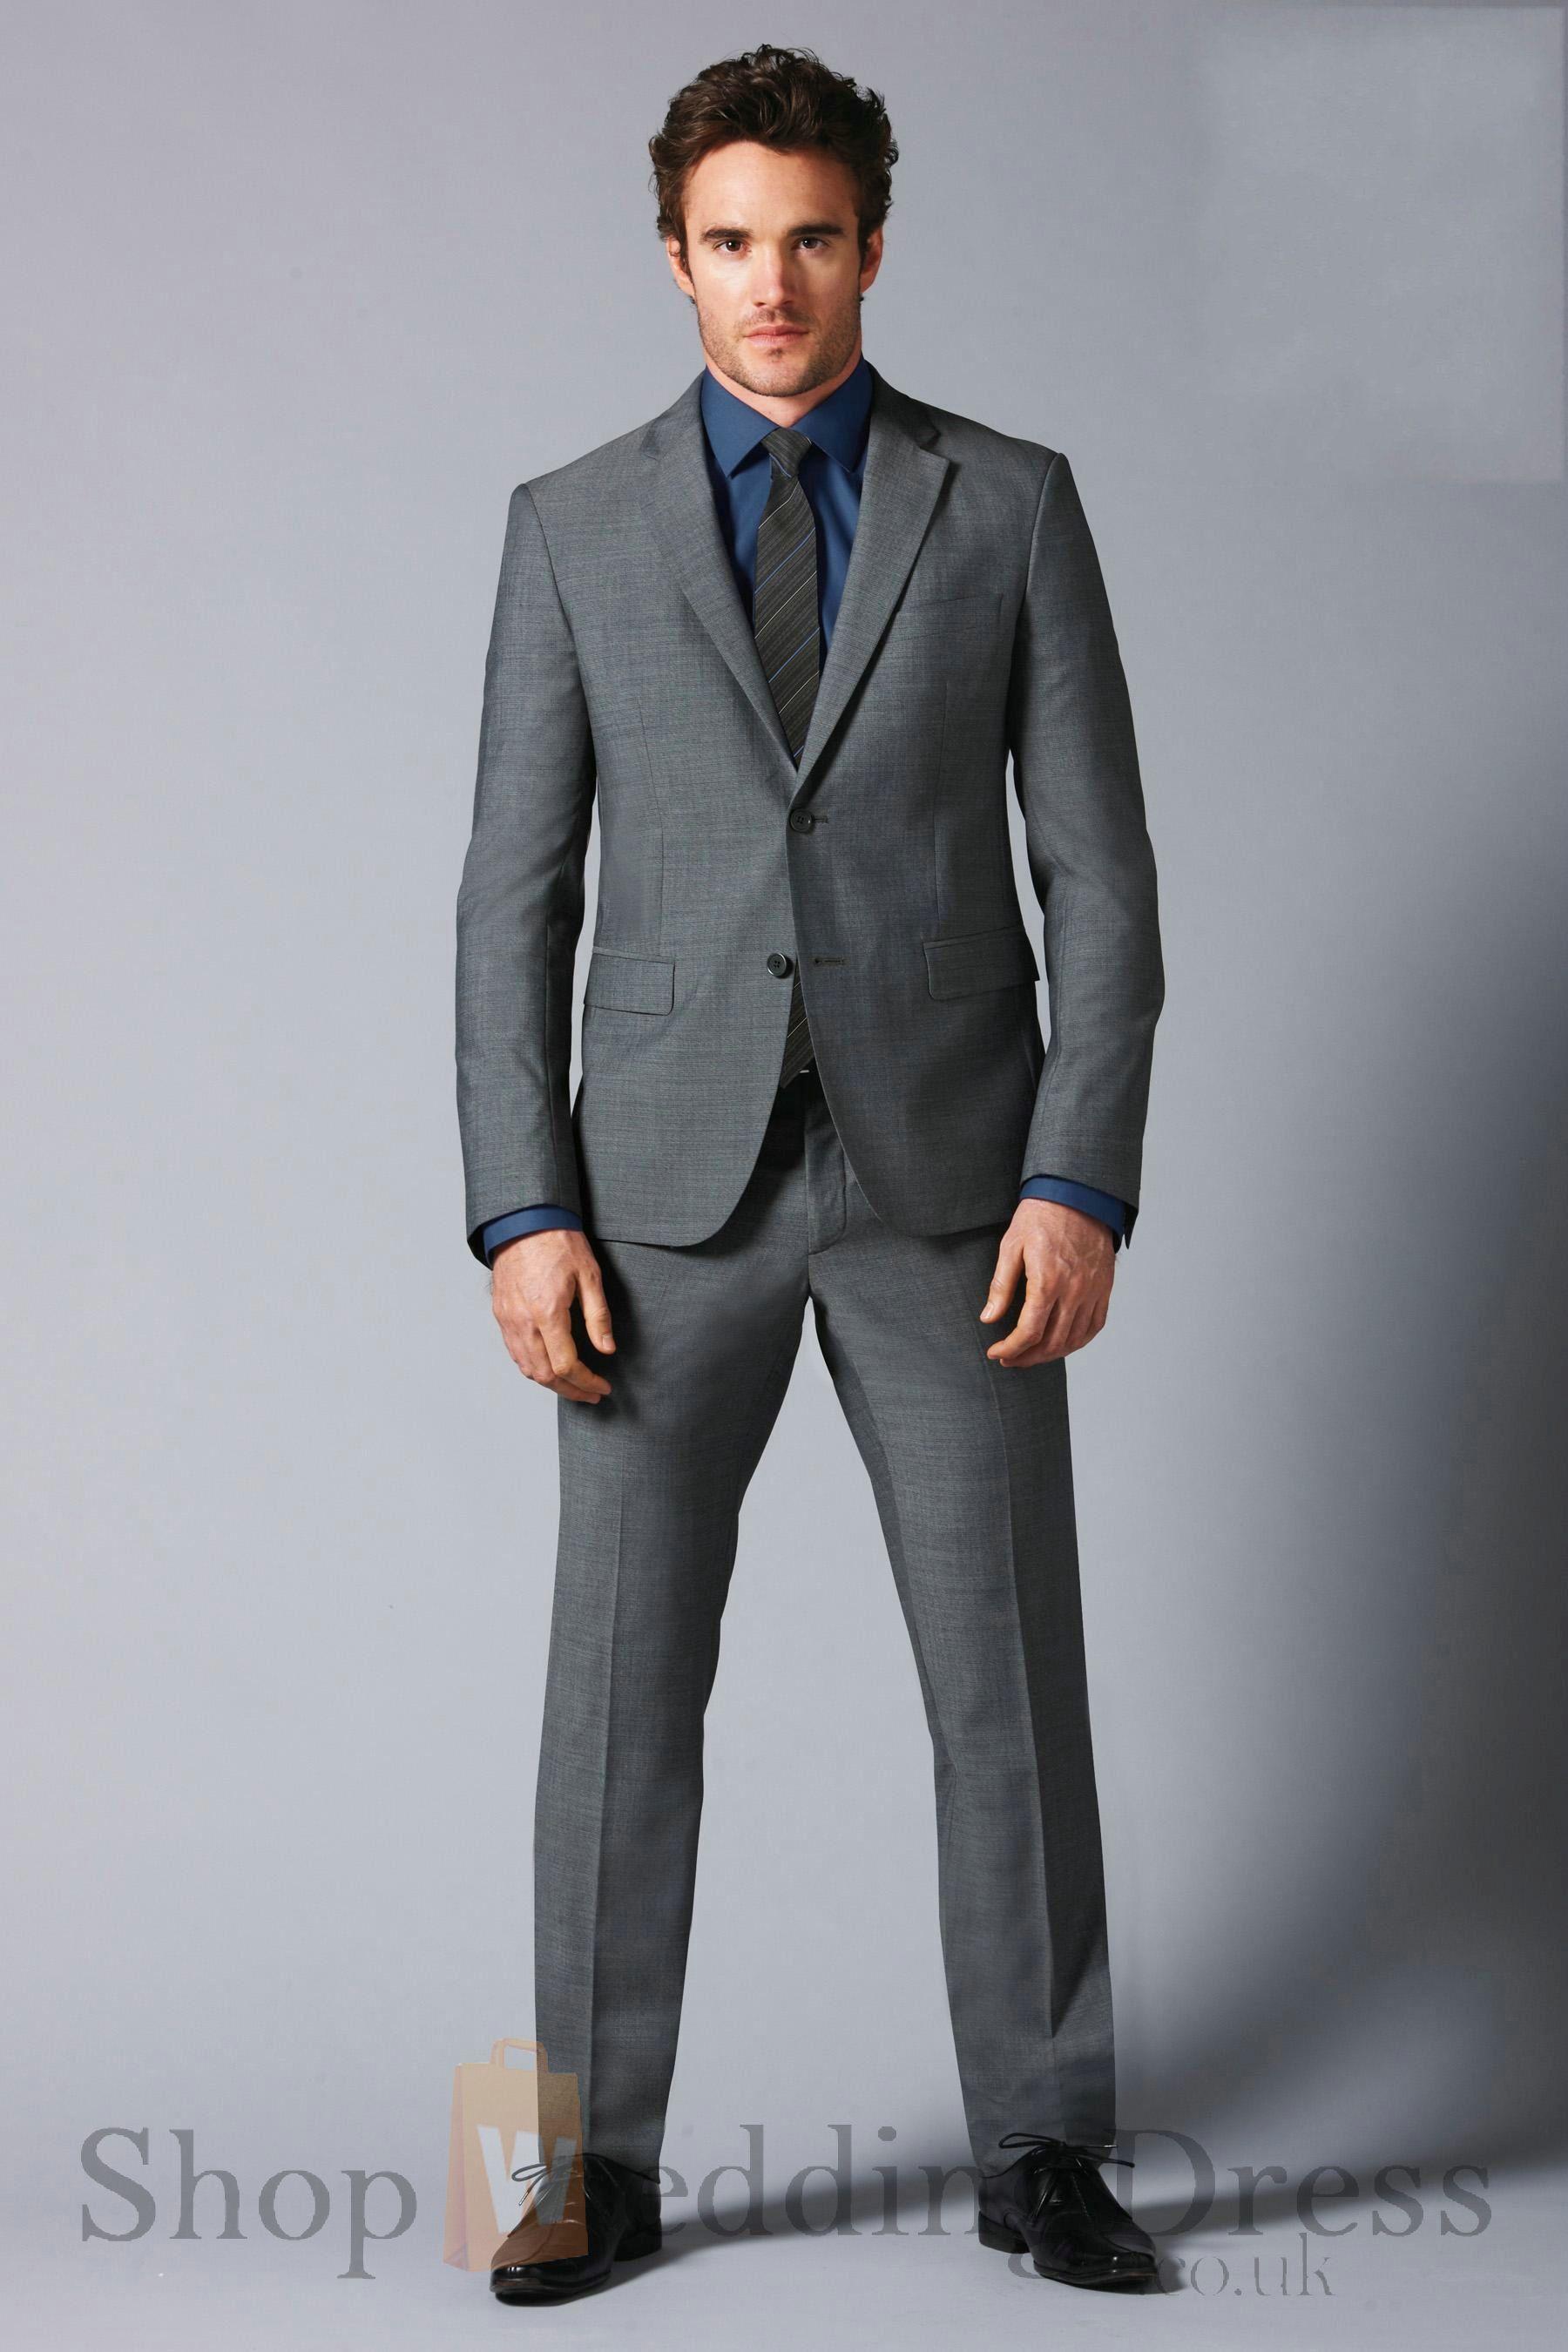 Mens Wedding Suit Ideas Delectable Suits Mens Wedding Cool | ღ He ...